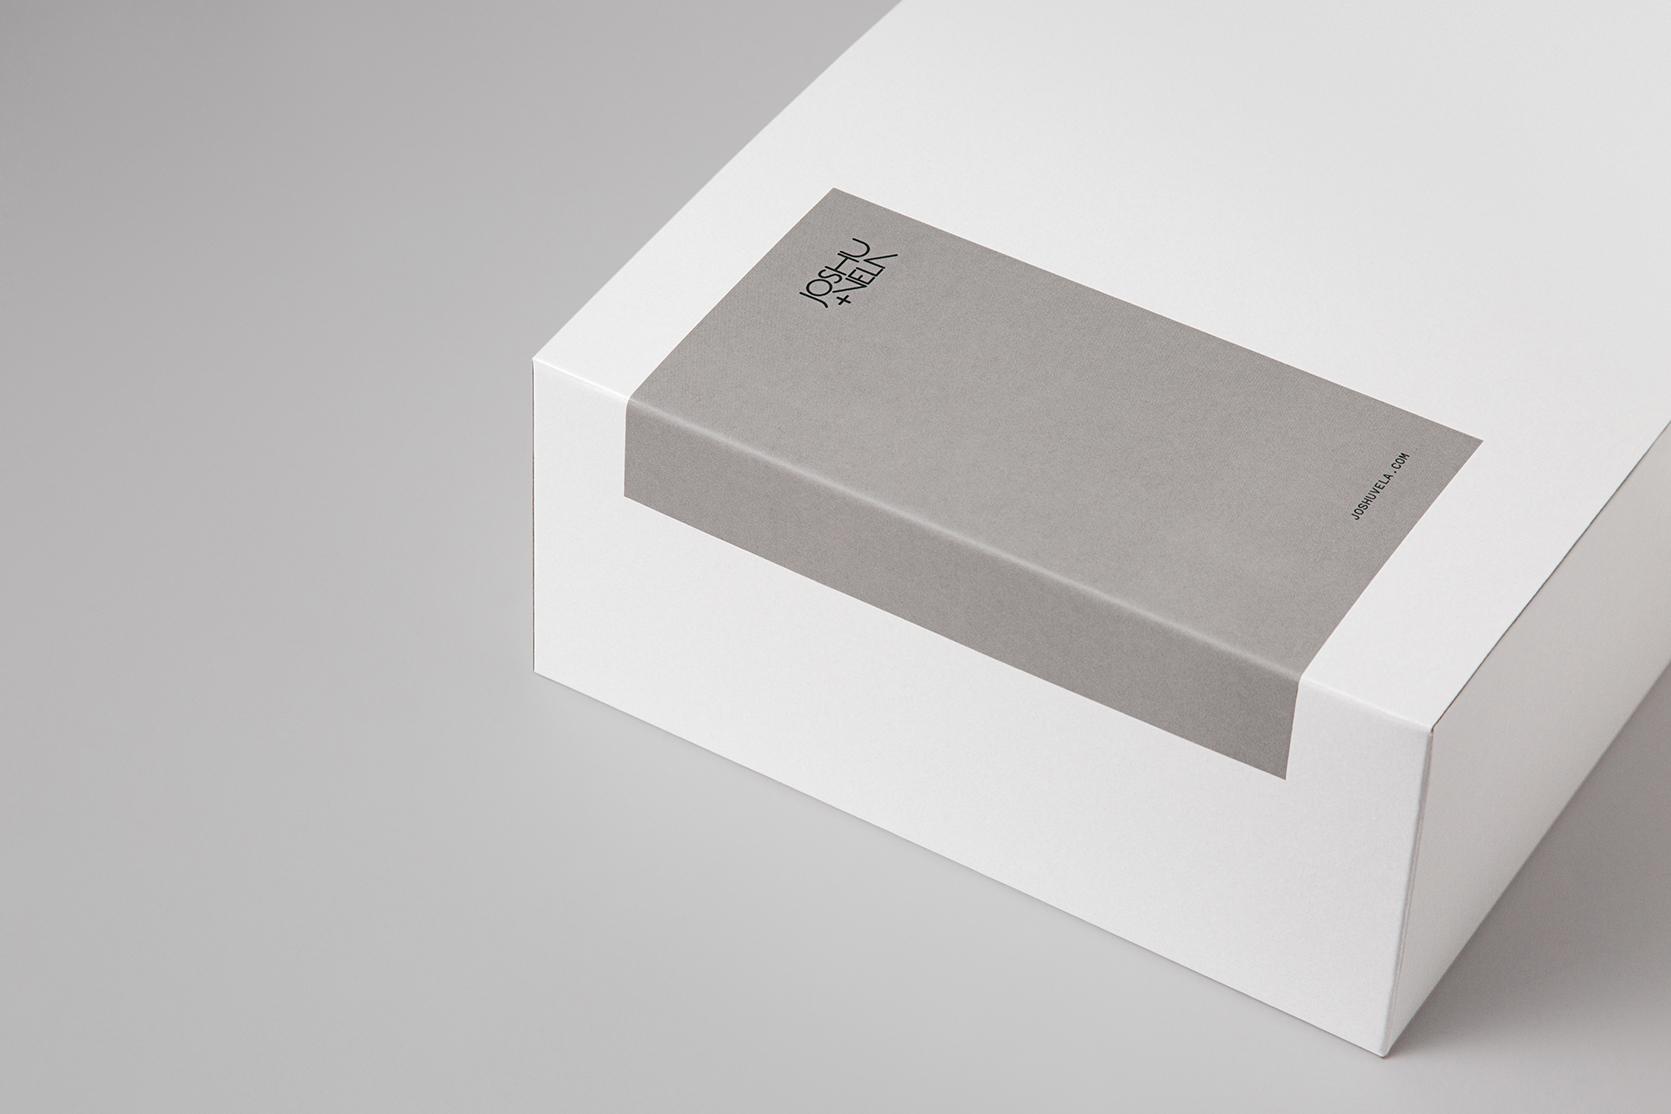 Julia-Kostreva-Studio-Branding-Joshu-Vela--ecommerce-shipping-procuct-box-sticker-2.jpg